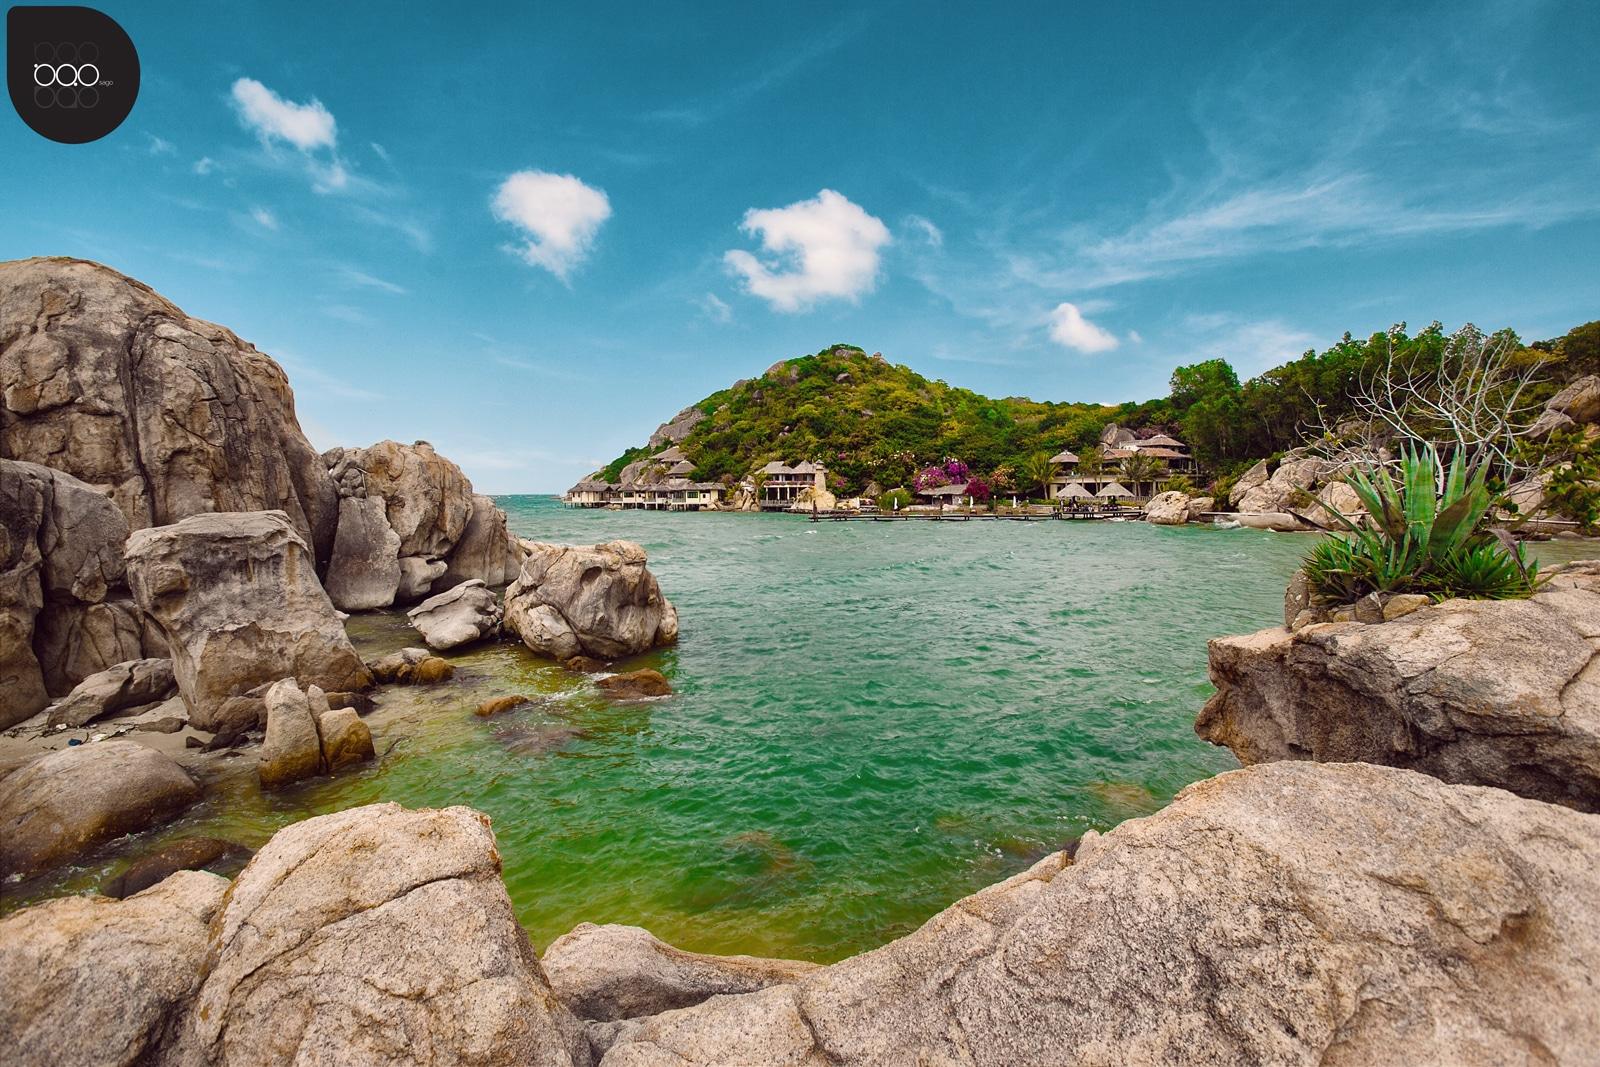 Ngoc Suong Resort in Cam Ranh Vietnam